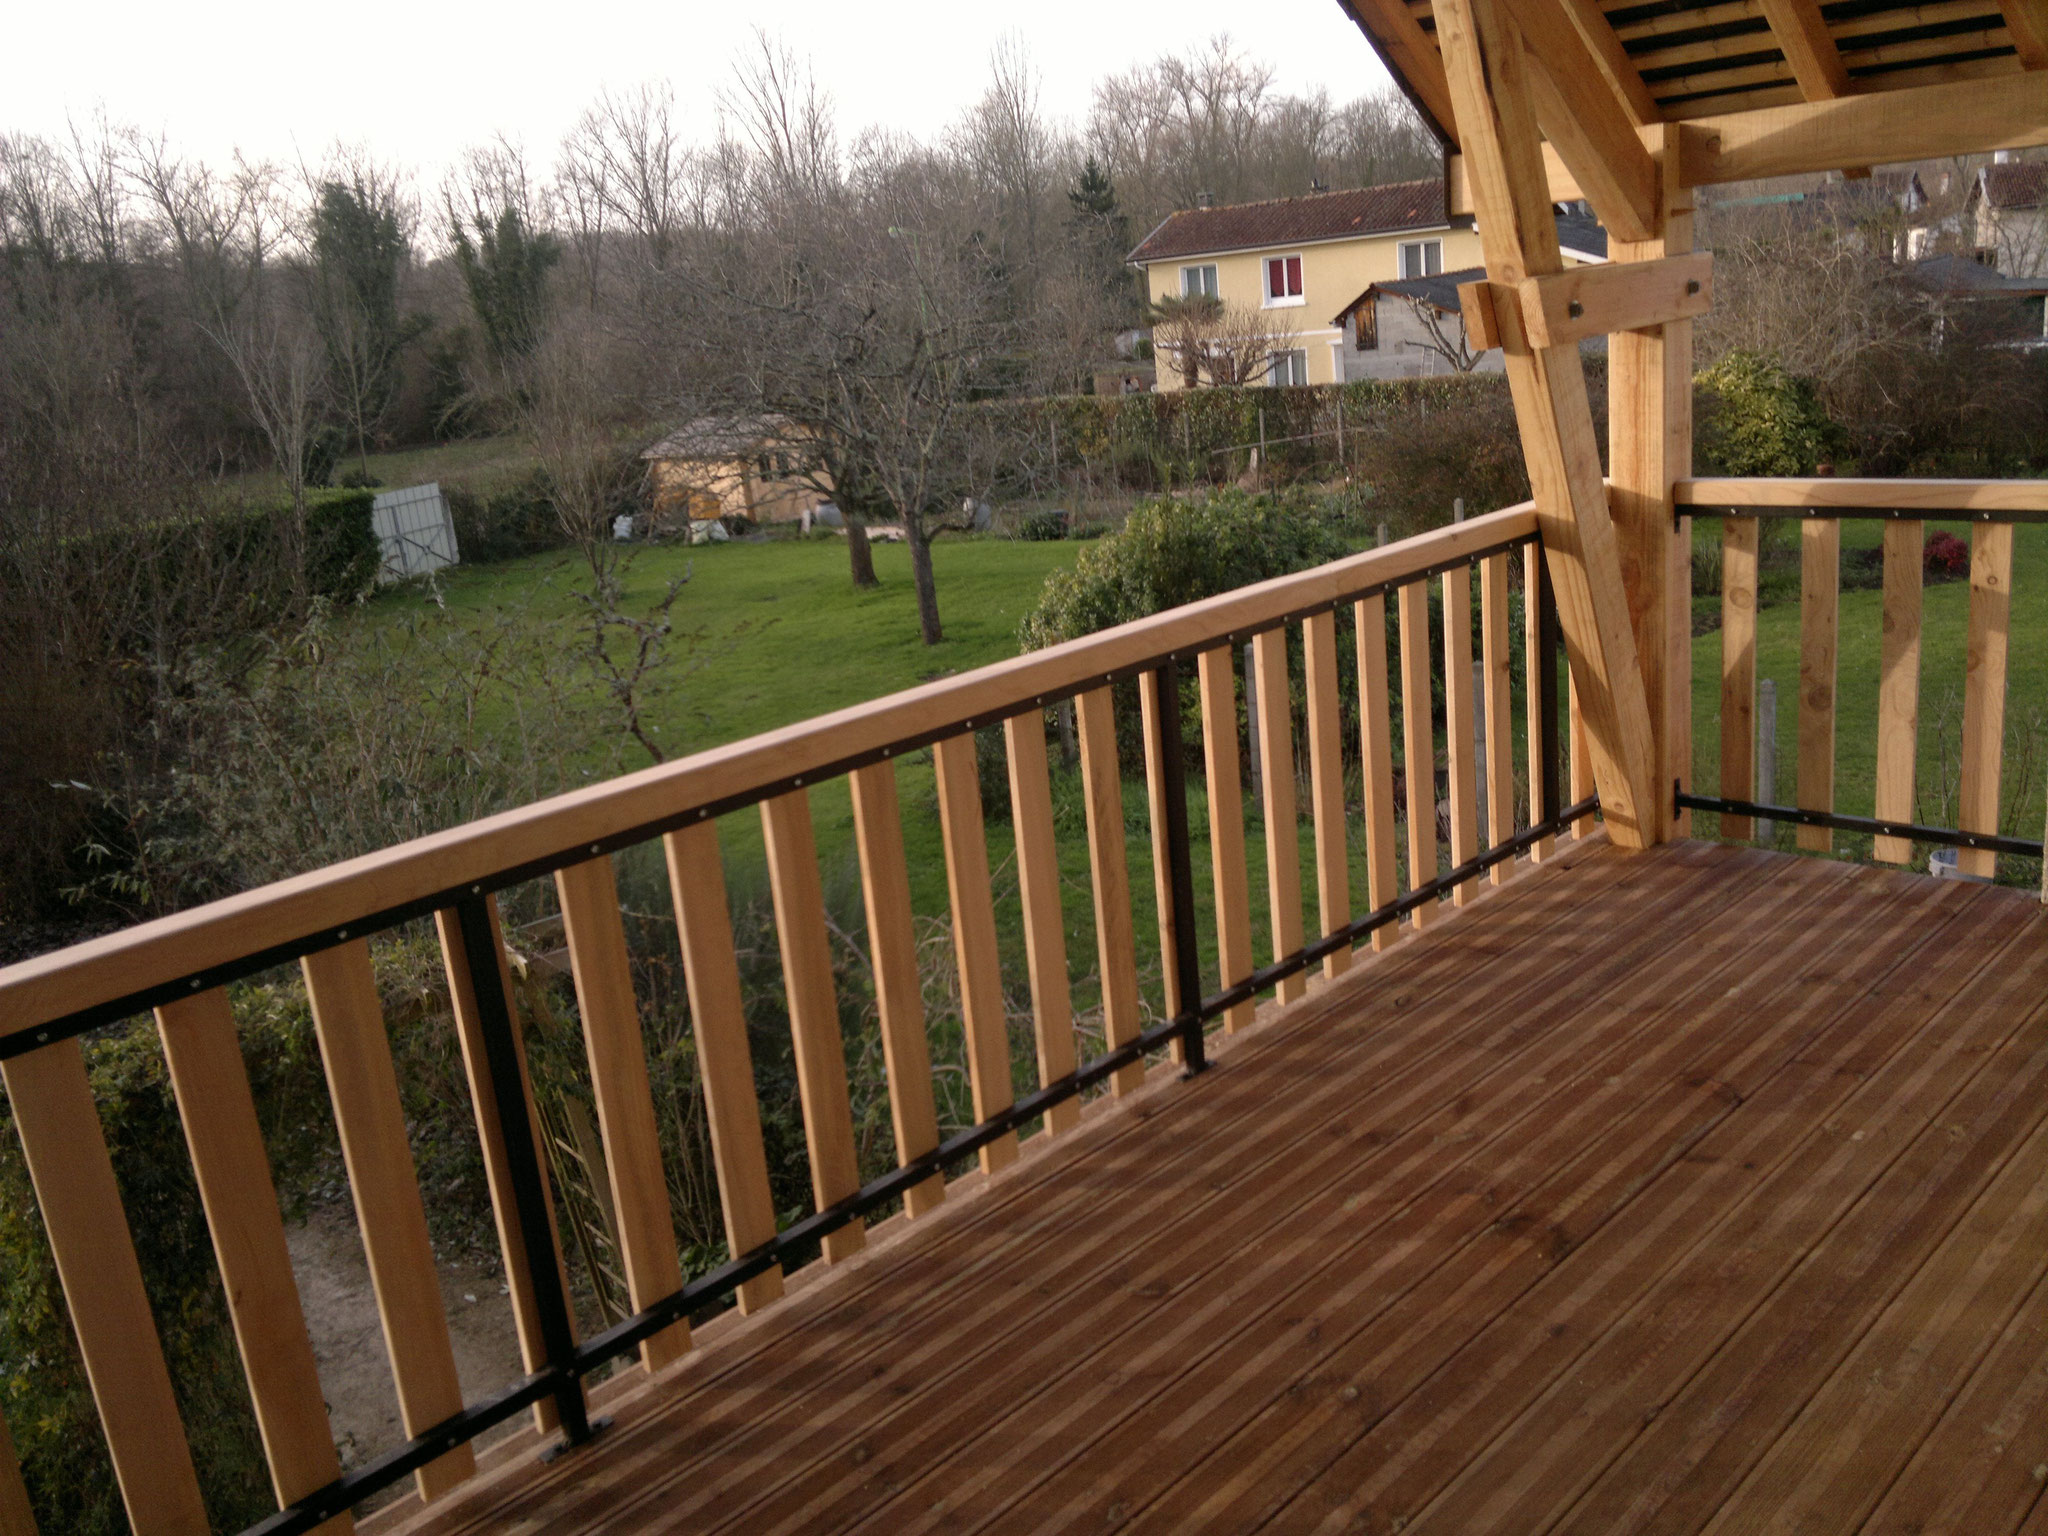 Agrandissement balcon couvert charpente bois